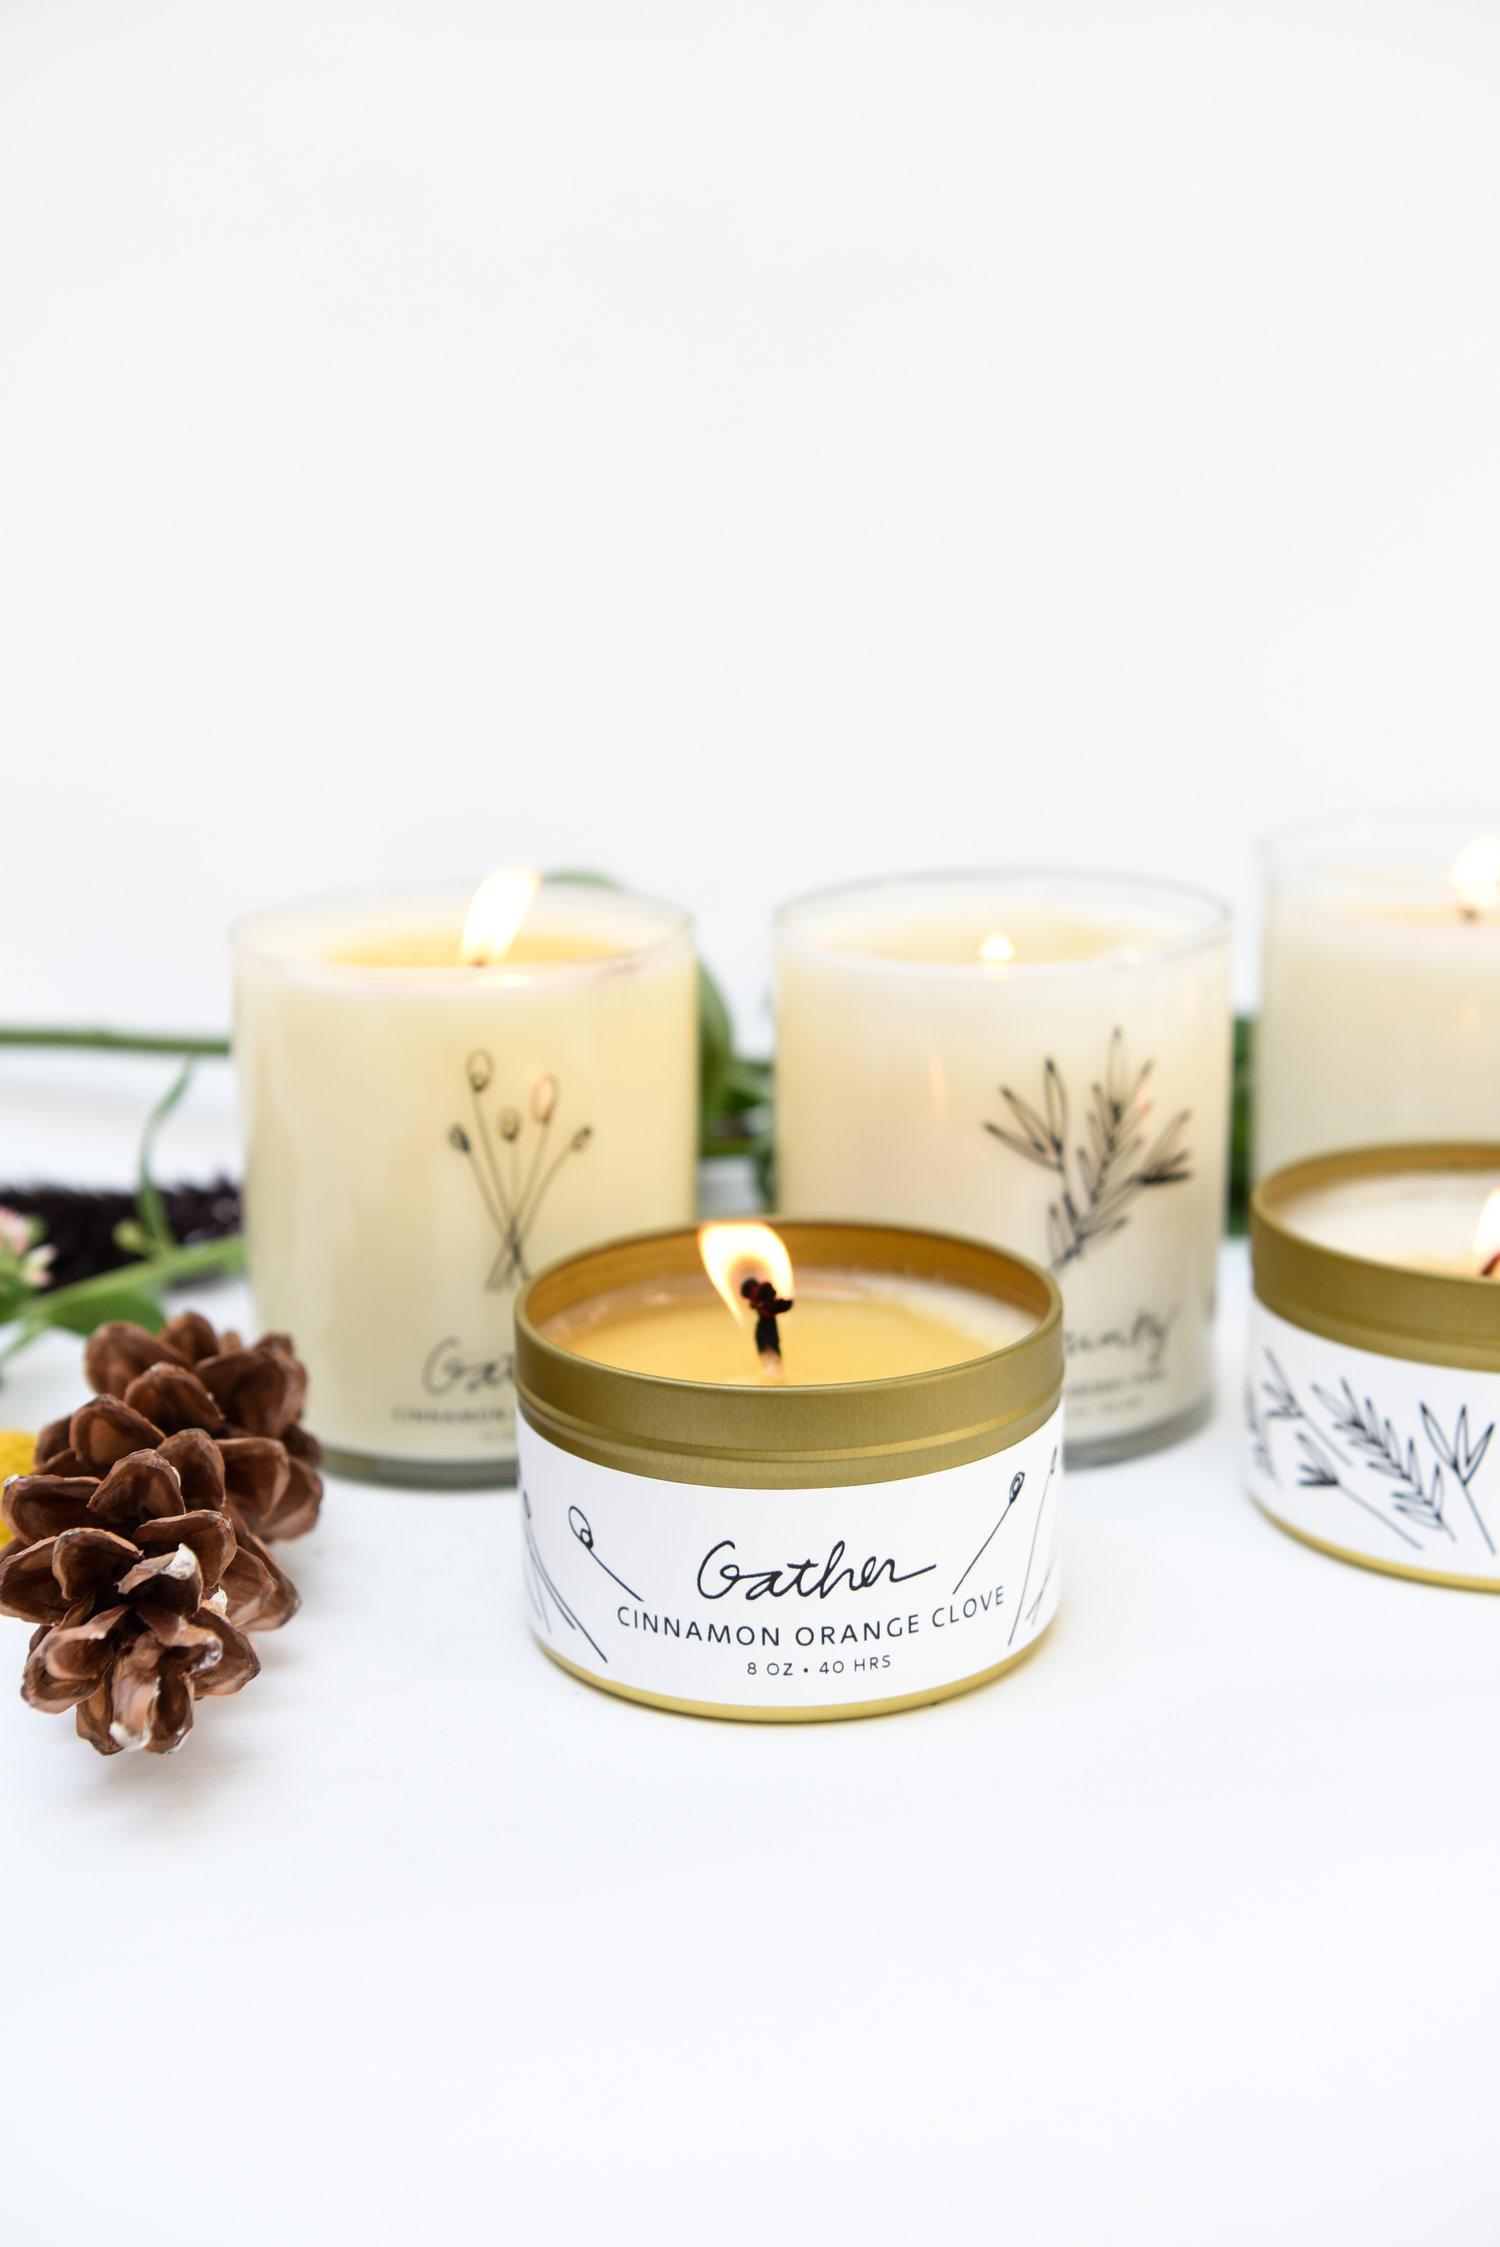 Handmade Habitat Gather Soy Candle Tin Cinnamon Orange Clove Natural Wax Scented Candles Vanilla